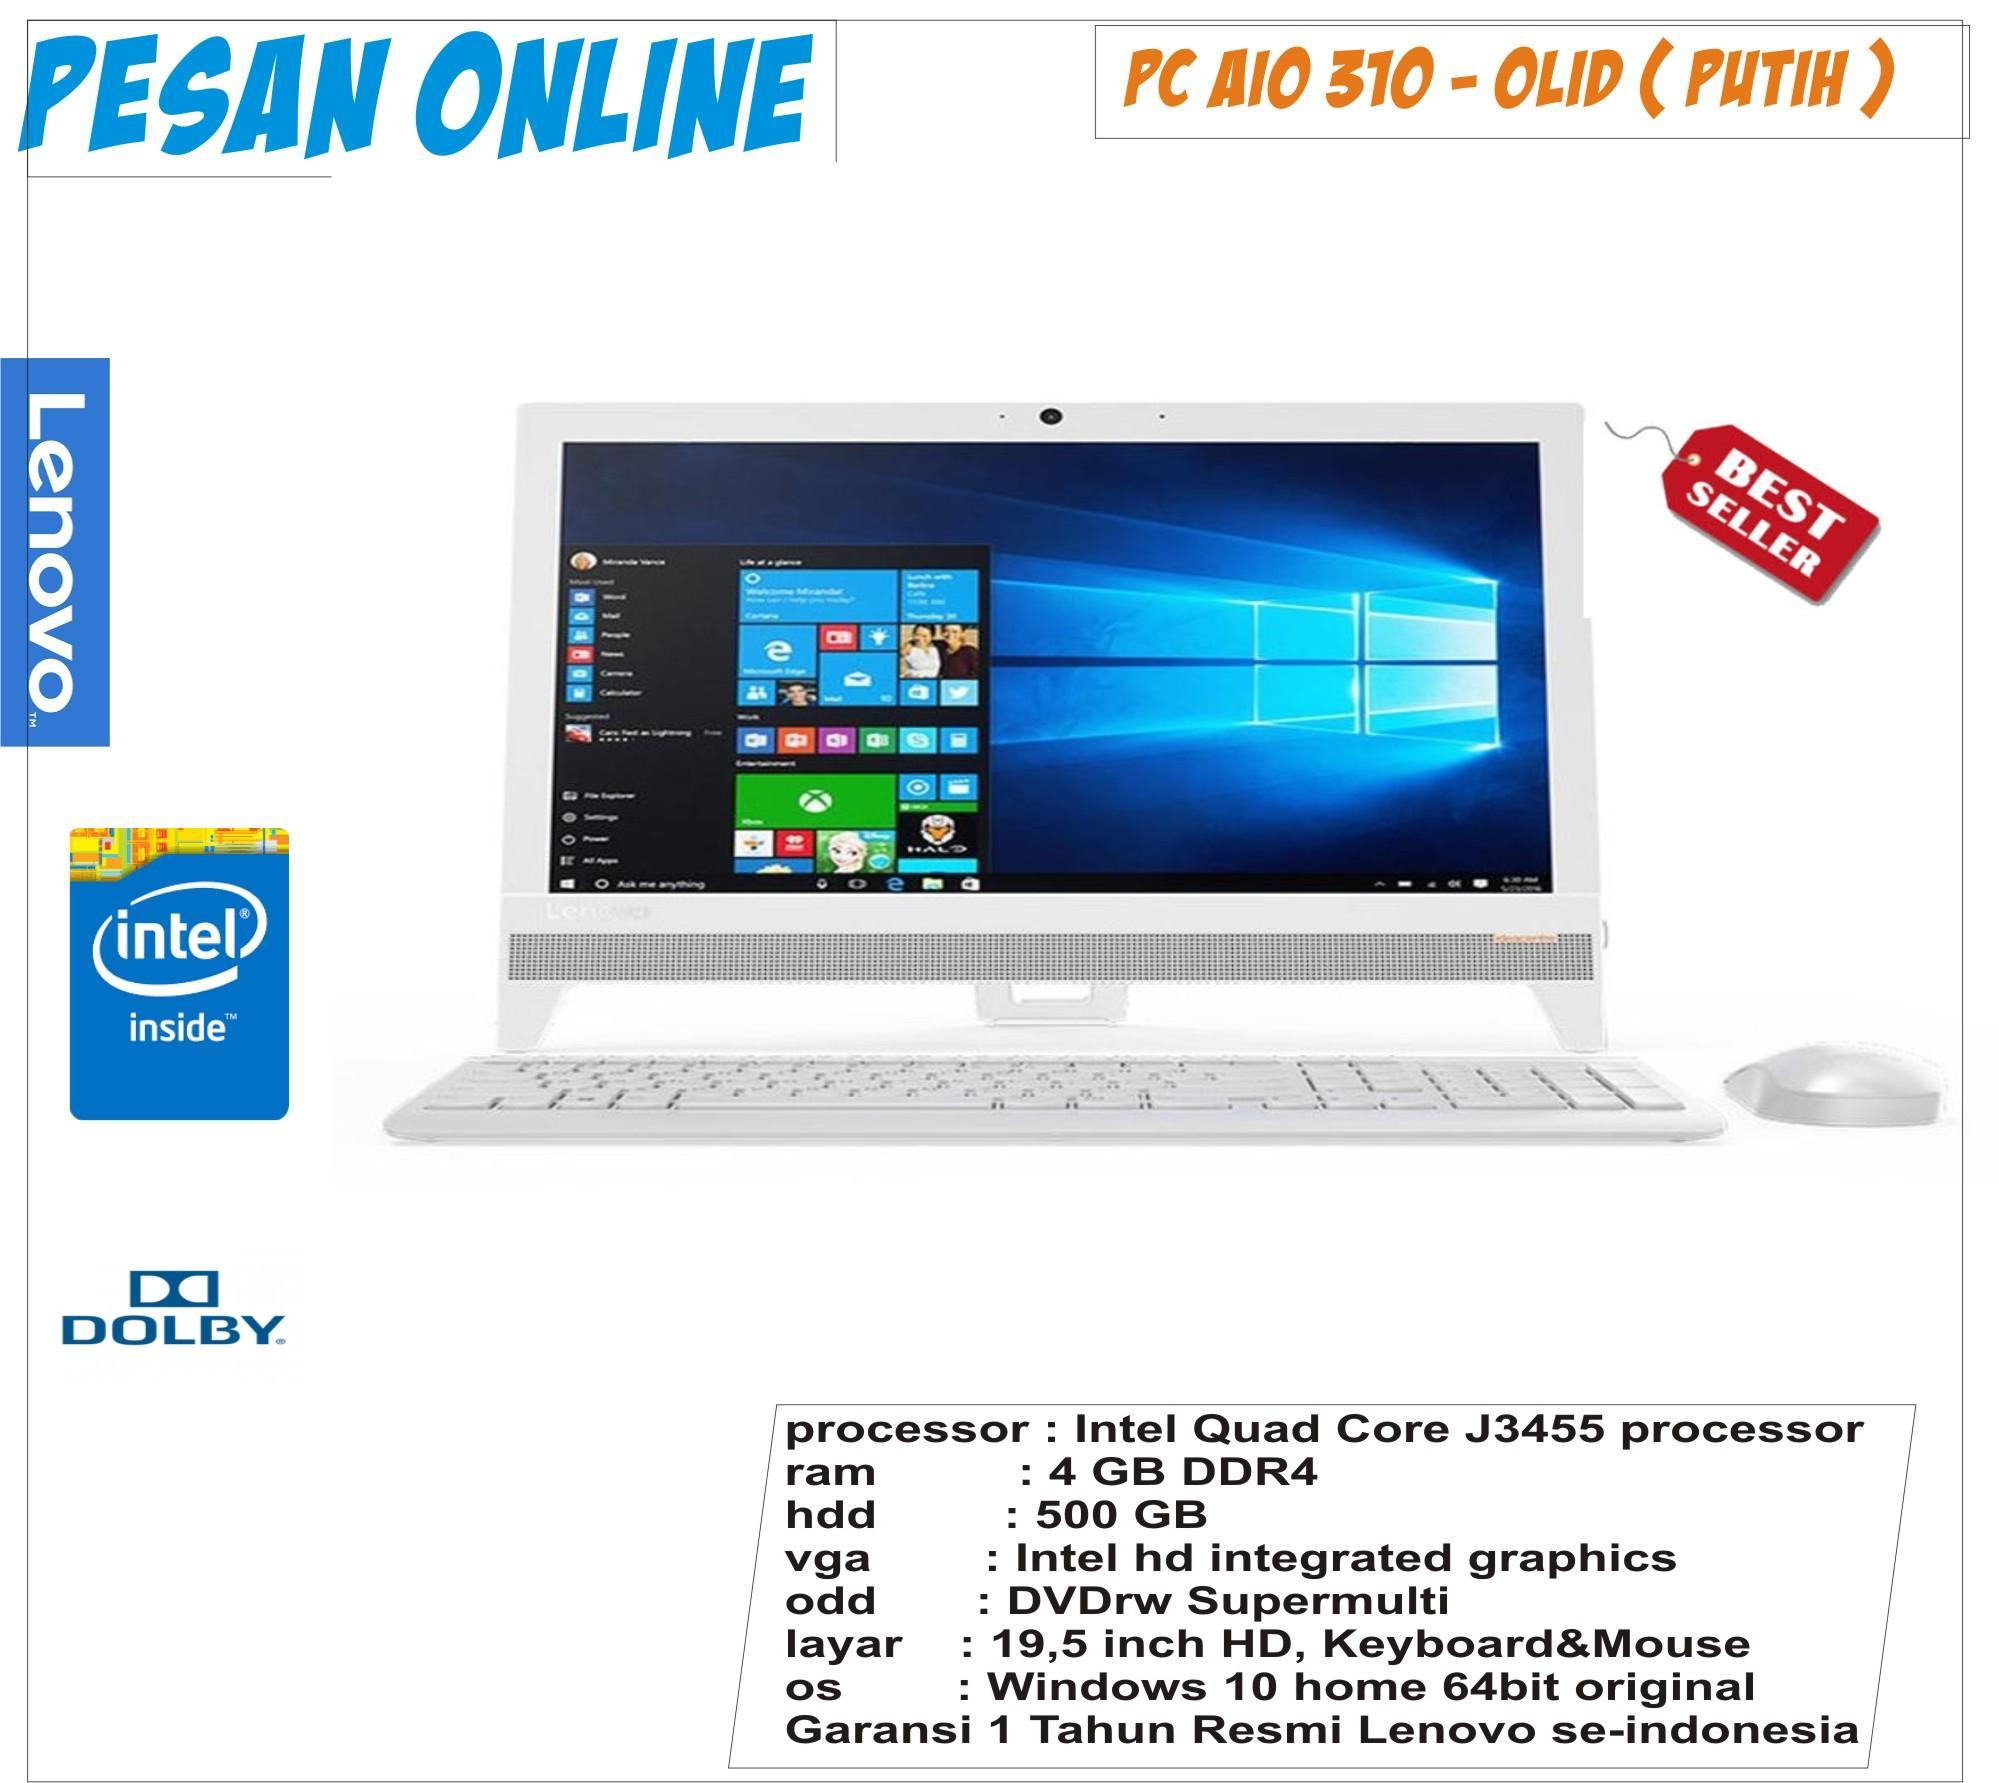 Beli Lenovo Ram 4gb Ip 320 Amd A4 9120 Hdd 500gb Vga R3 Graphics Layar 14 Inch Aio 310 0lid Intel J3455 Focl000lid Win10 195 White Garansi Resmi